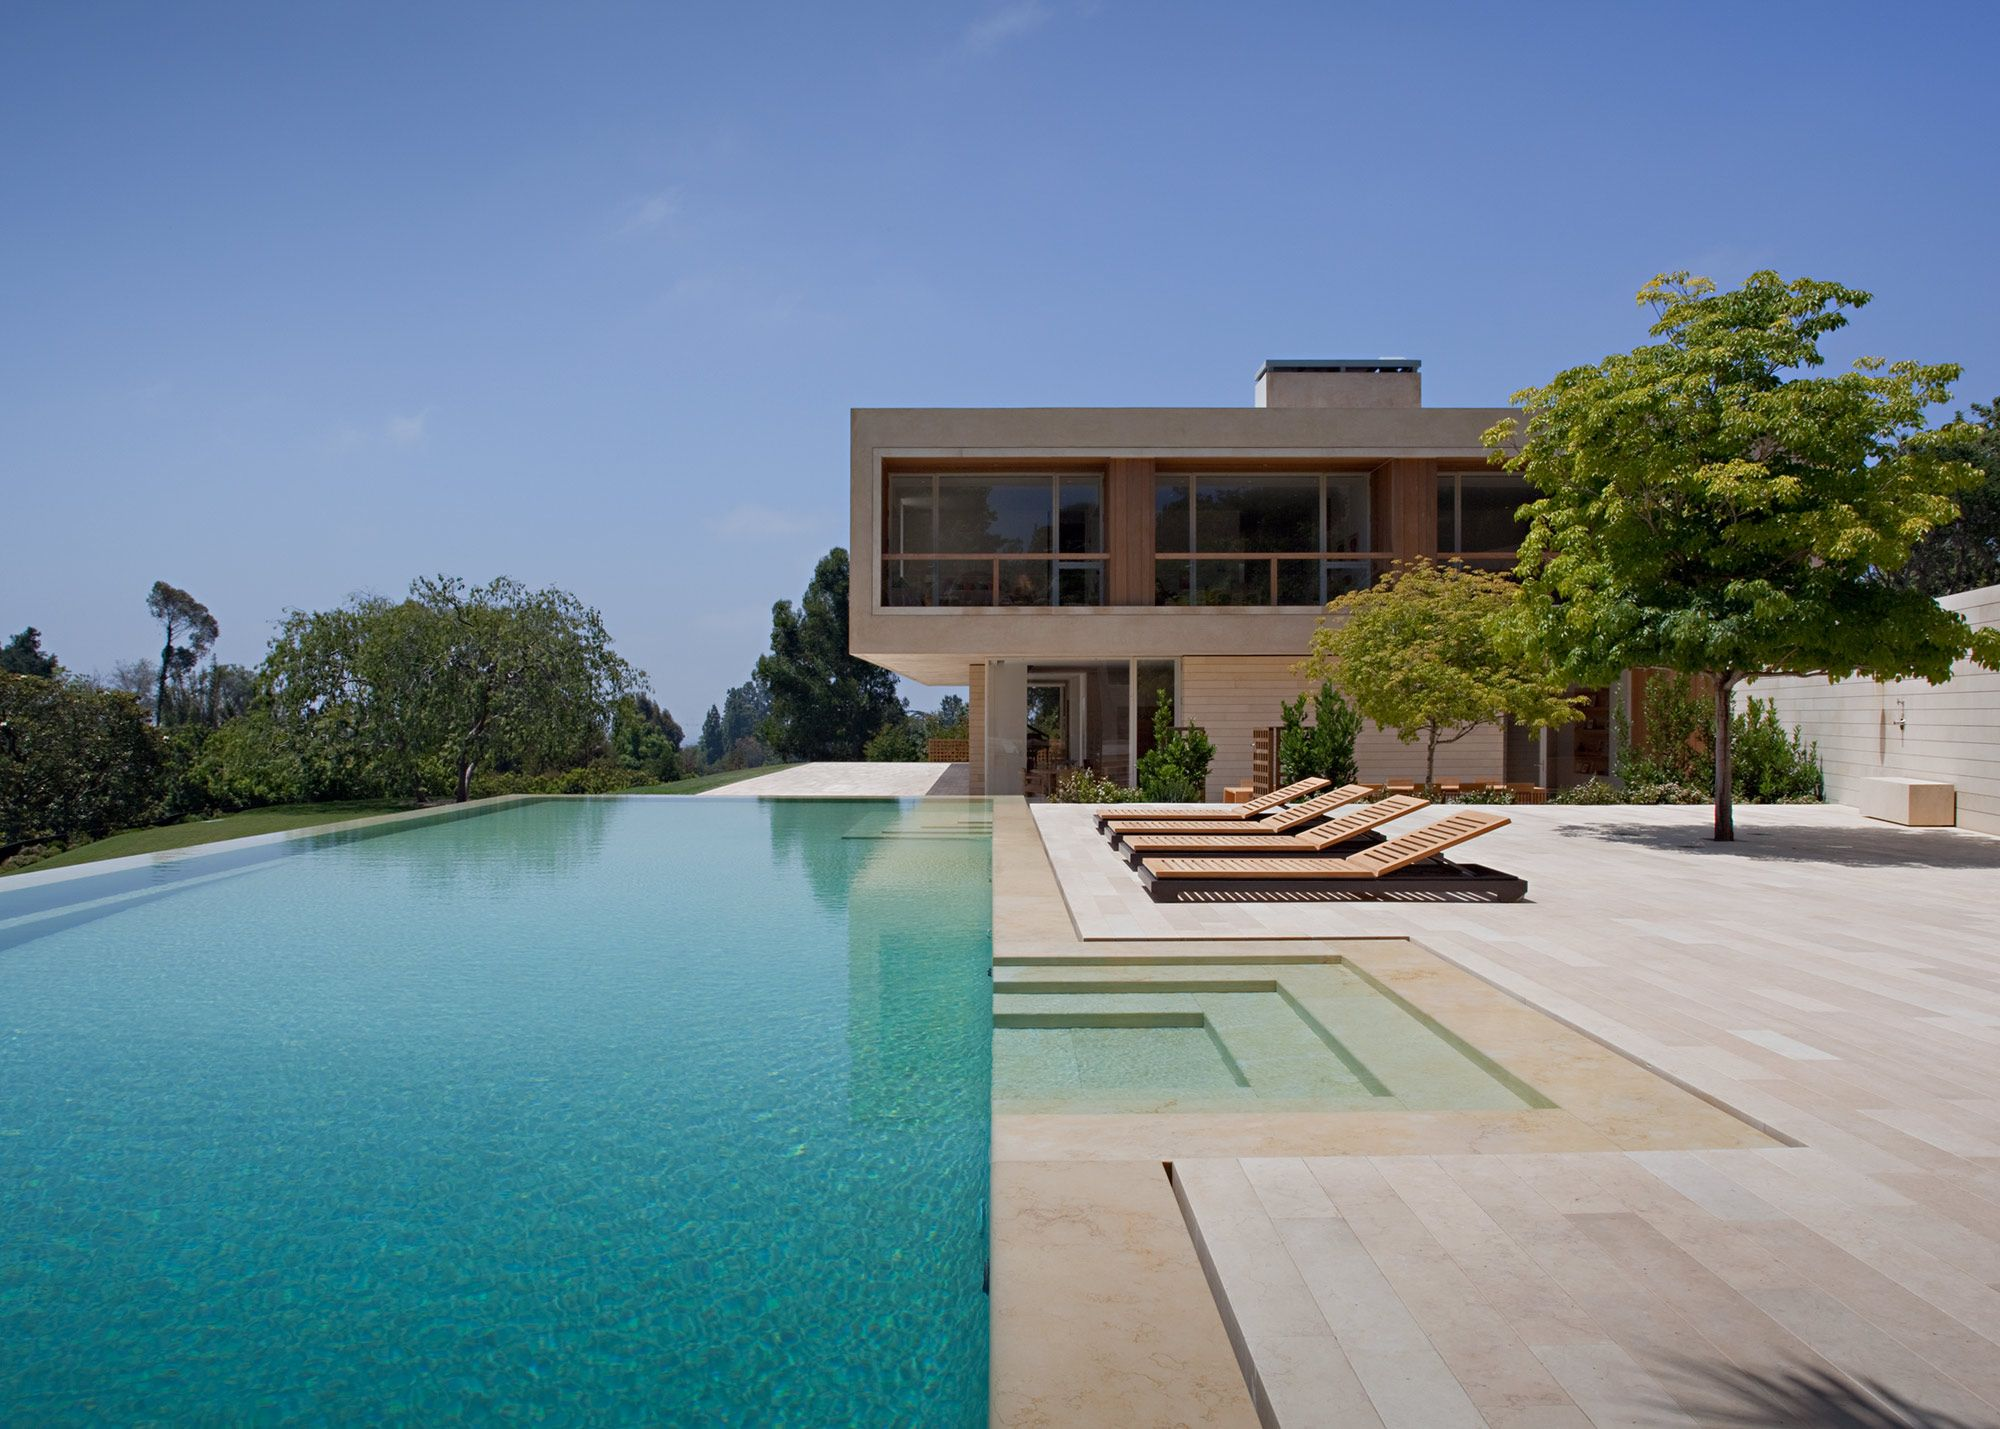 House Los Angeles, California John Pawson photo by